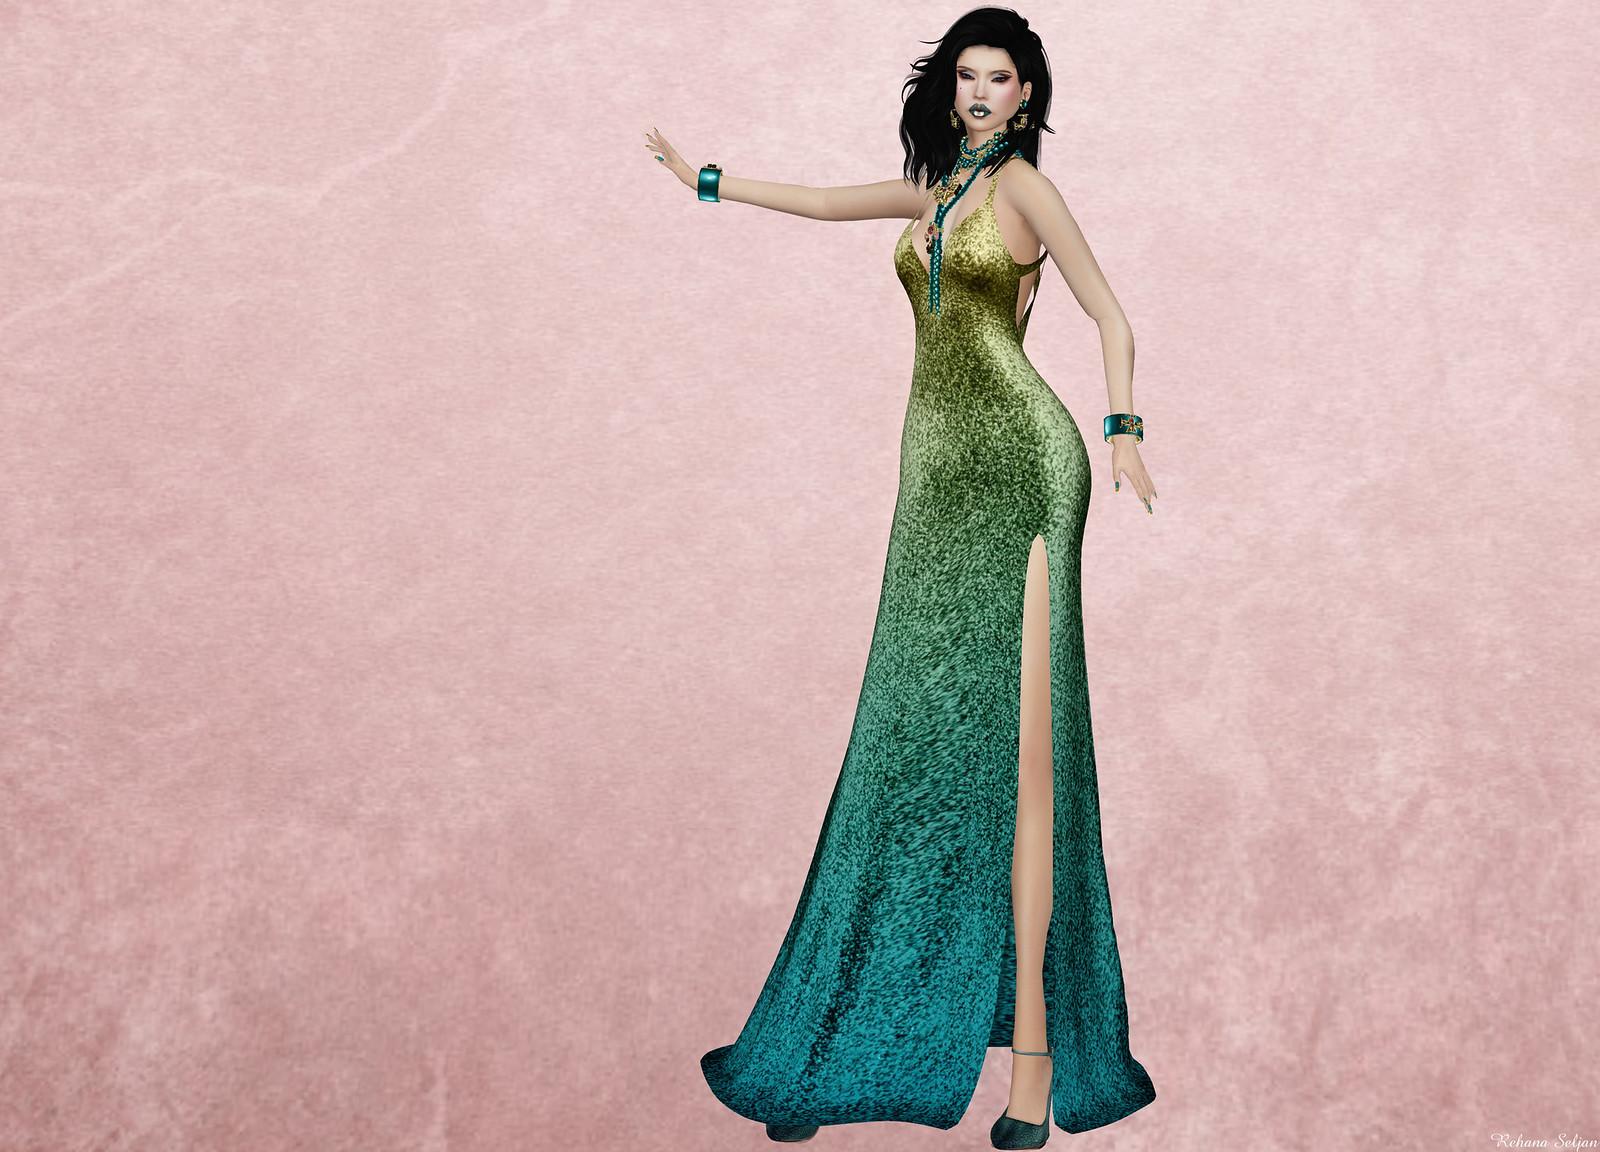 AMARELO MANGA - Ninfa Long Gown